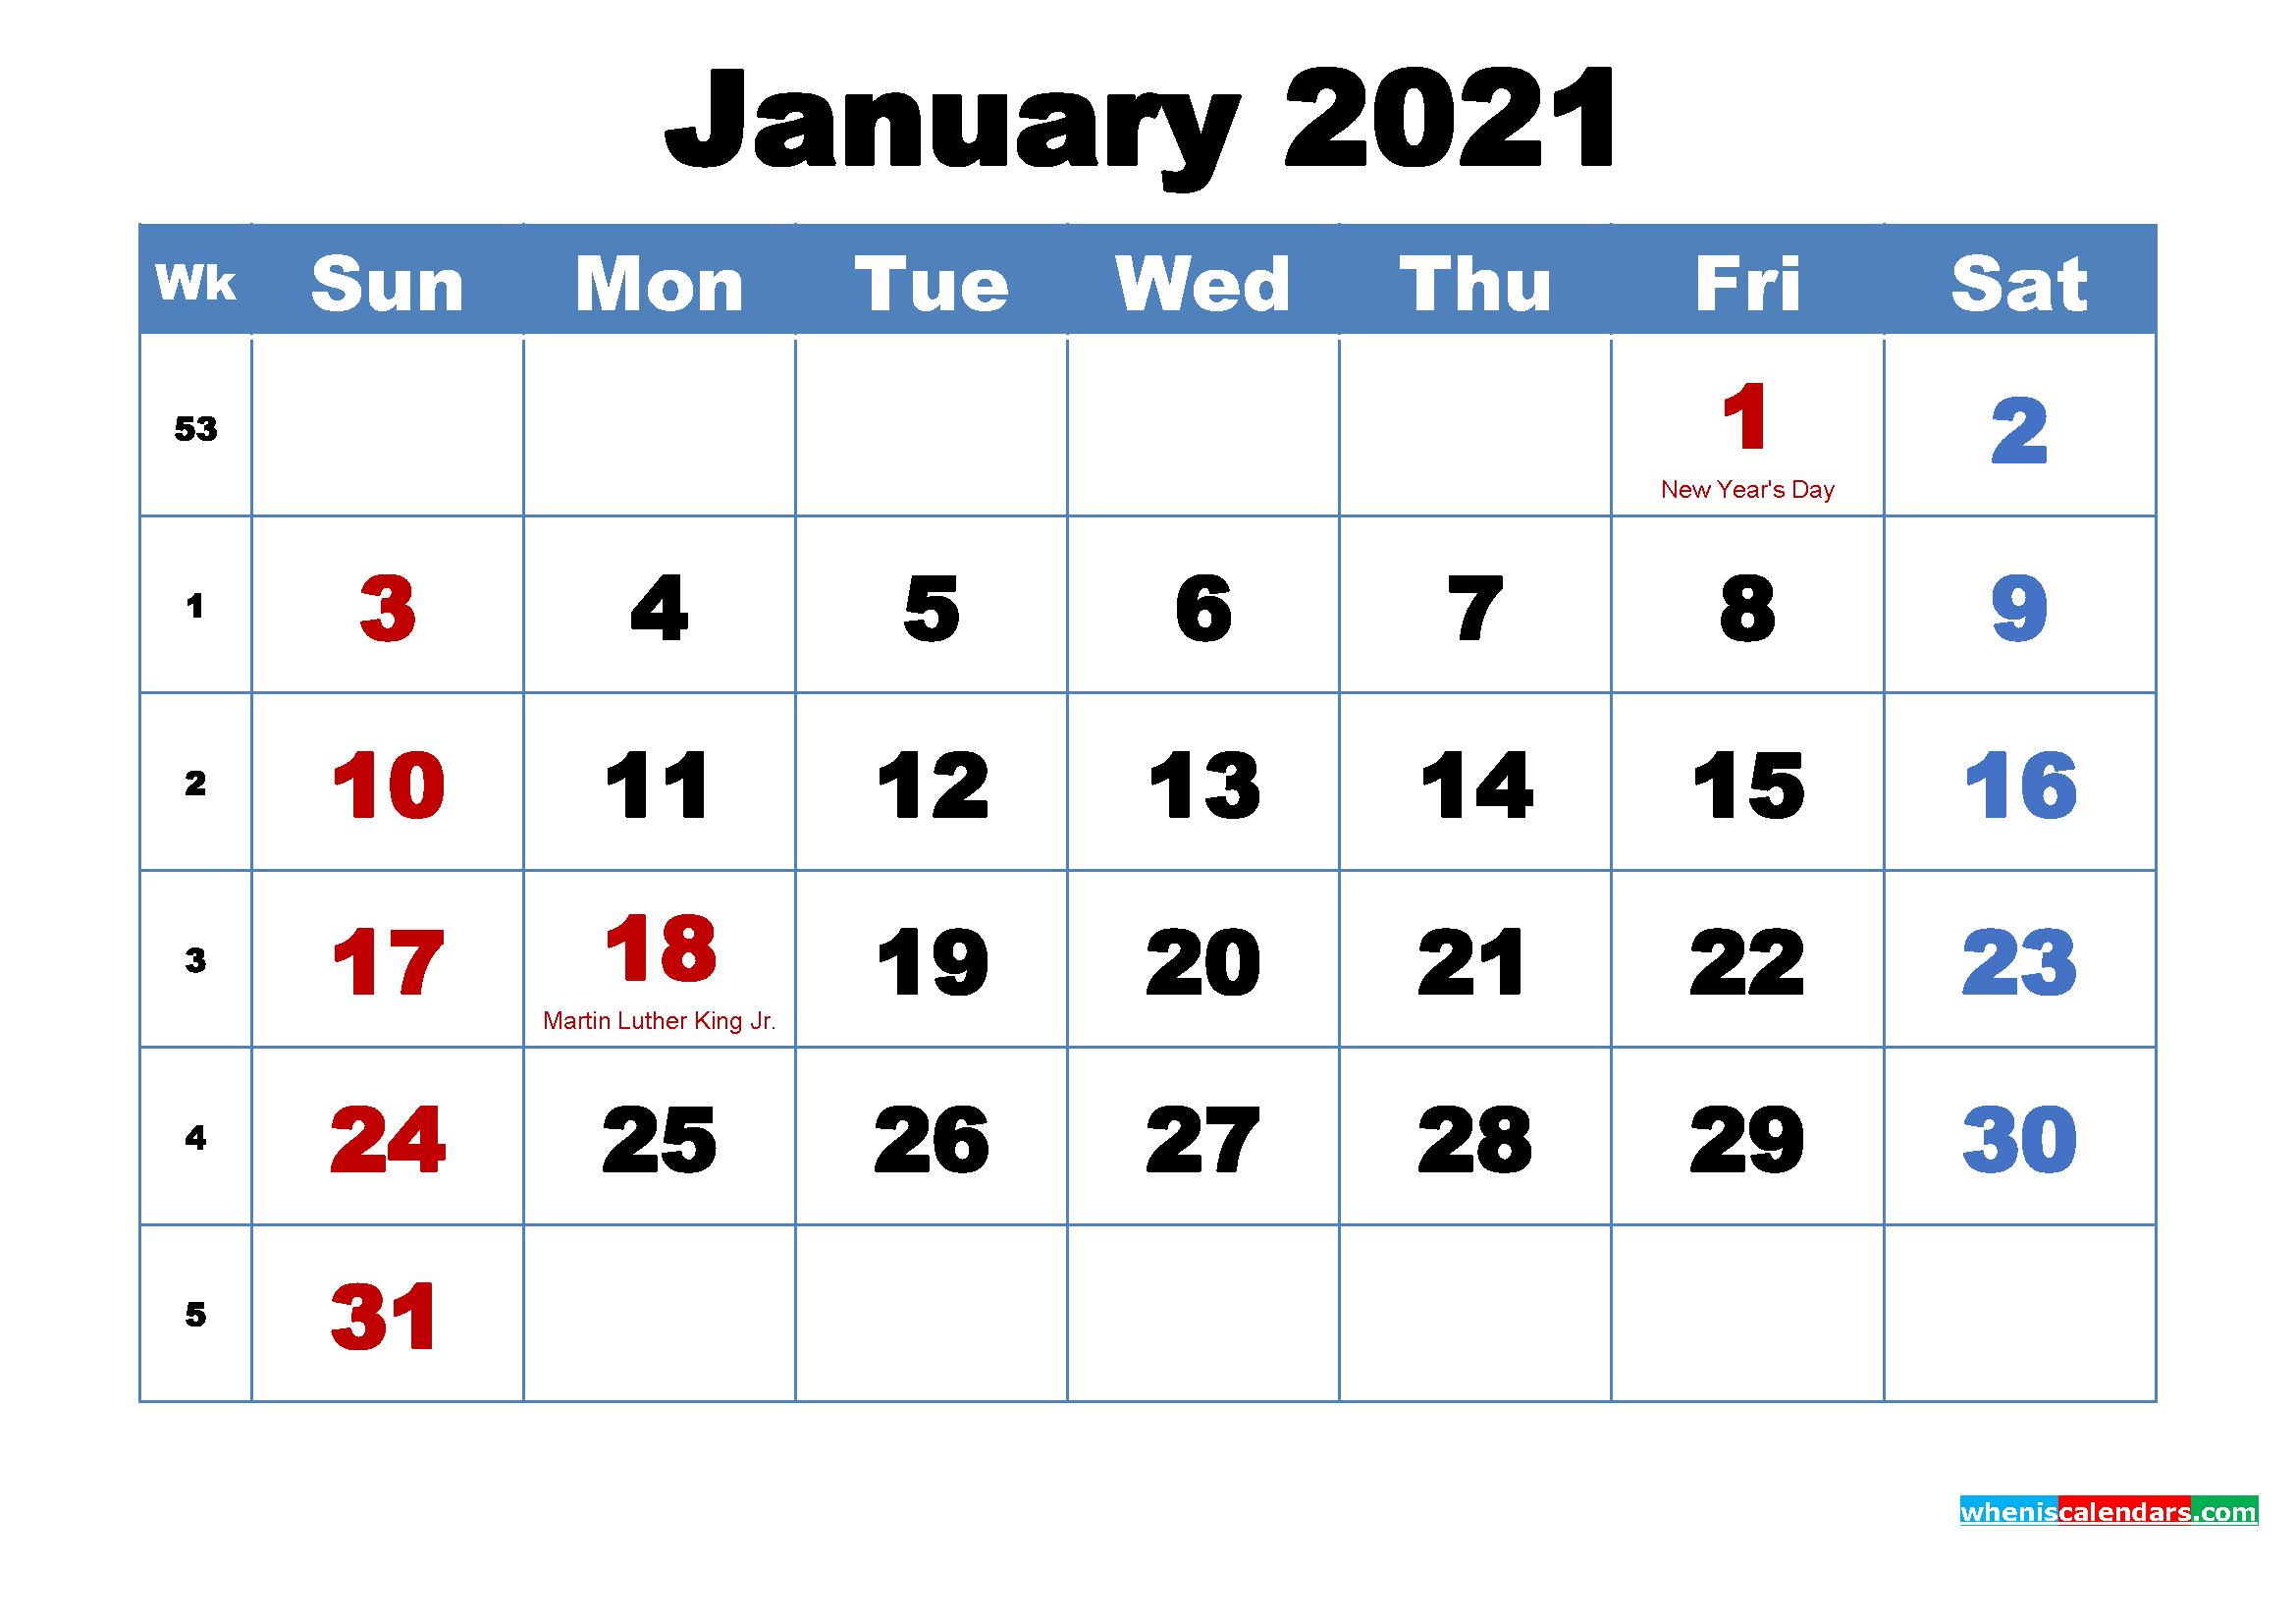 January 2021 Desktop Calendar Free Download